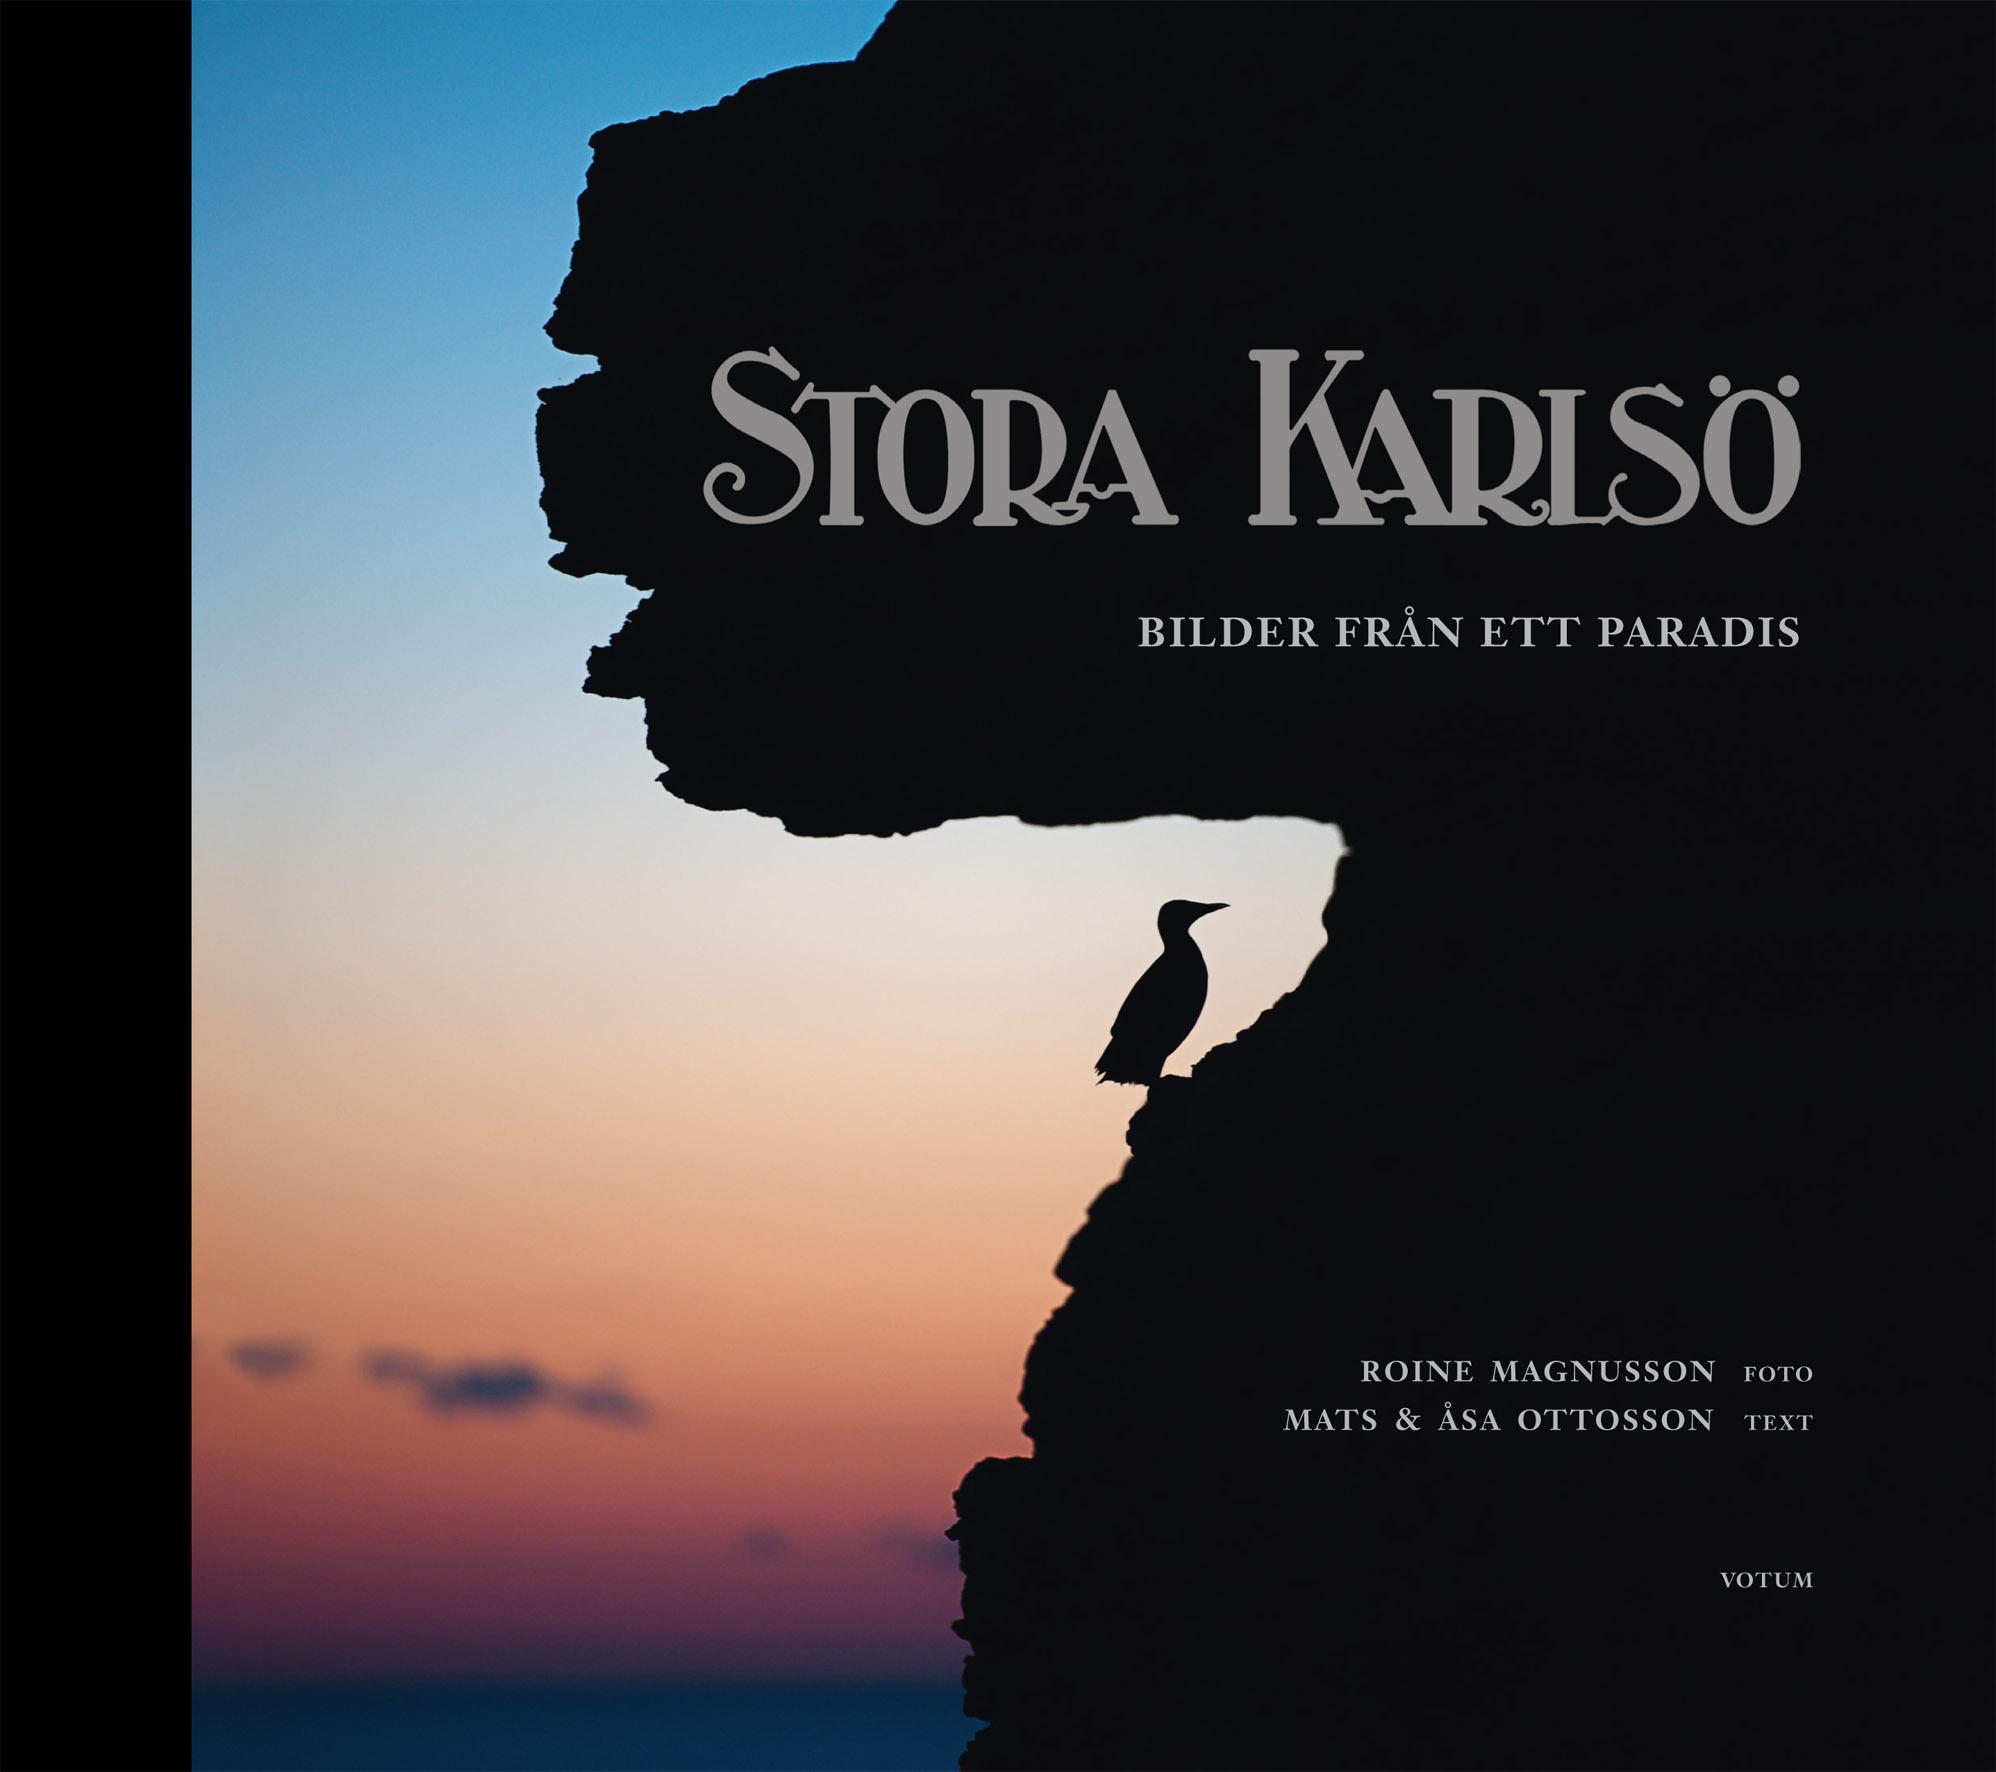 Stora Karlsö i SVT Gokväll